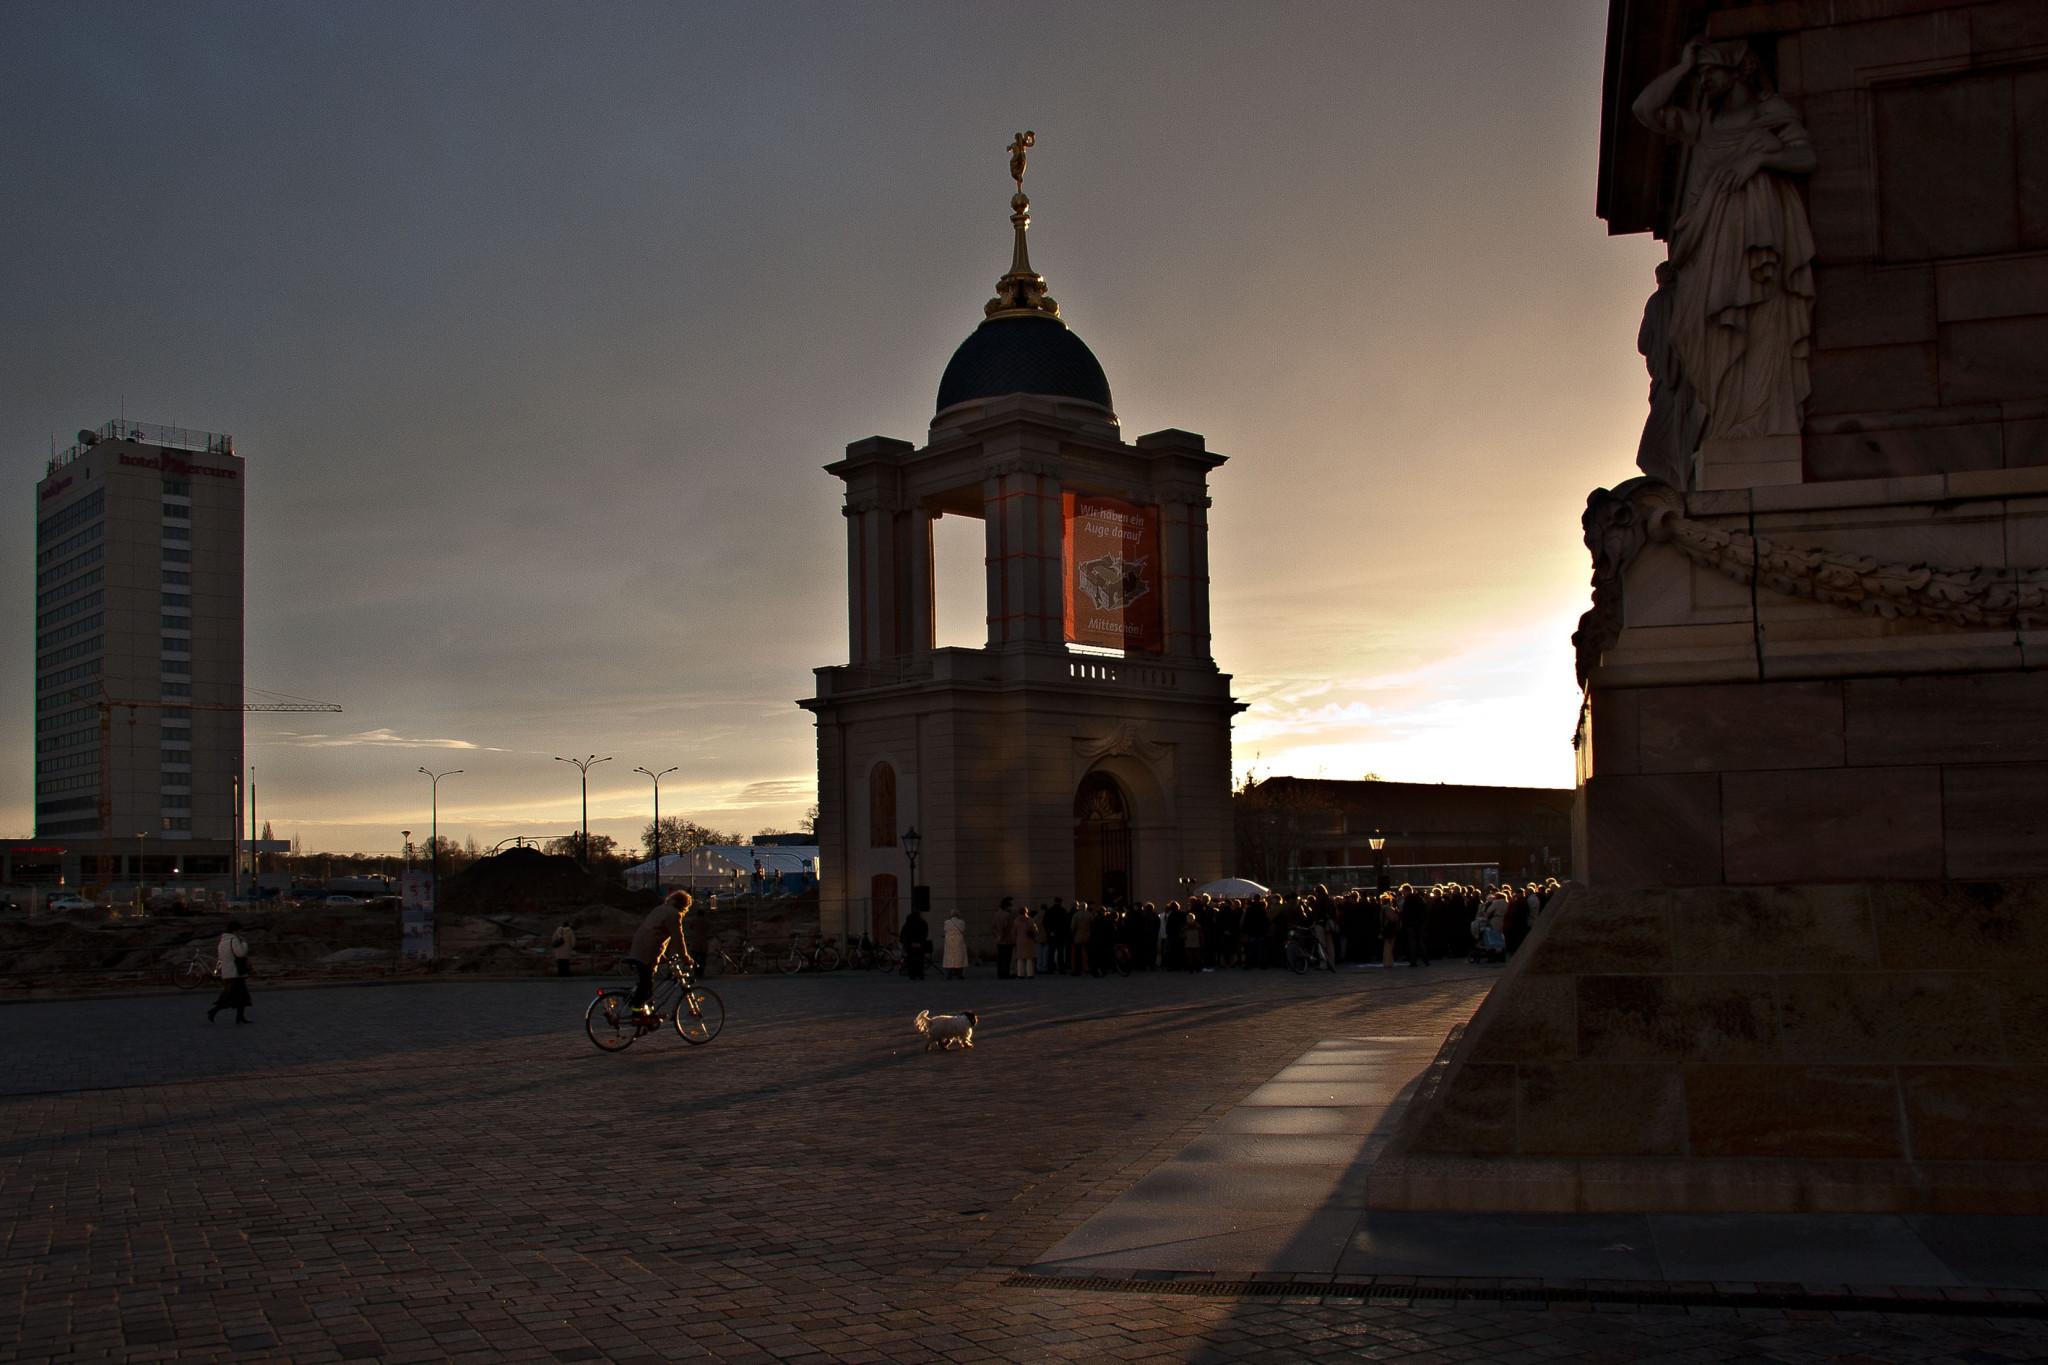 Fortunaportal vom Stadtschloss Potsdam